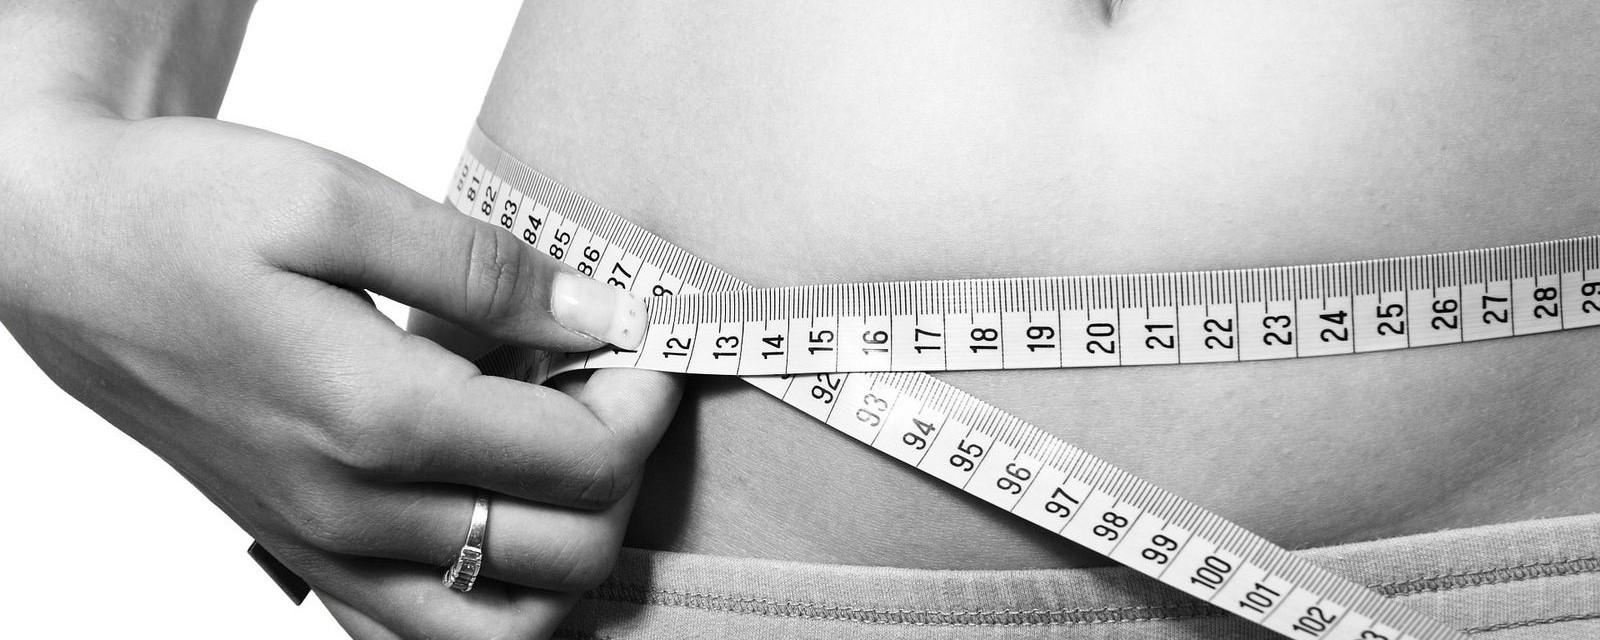 pot sa pierd in greutate)